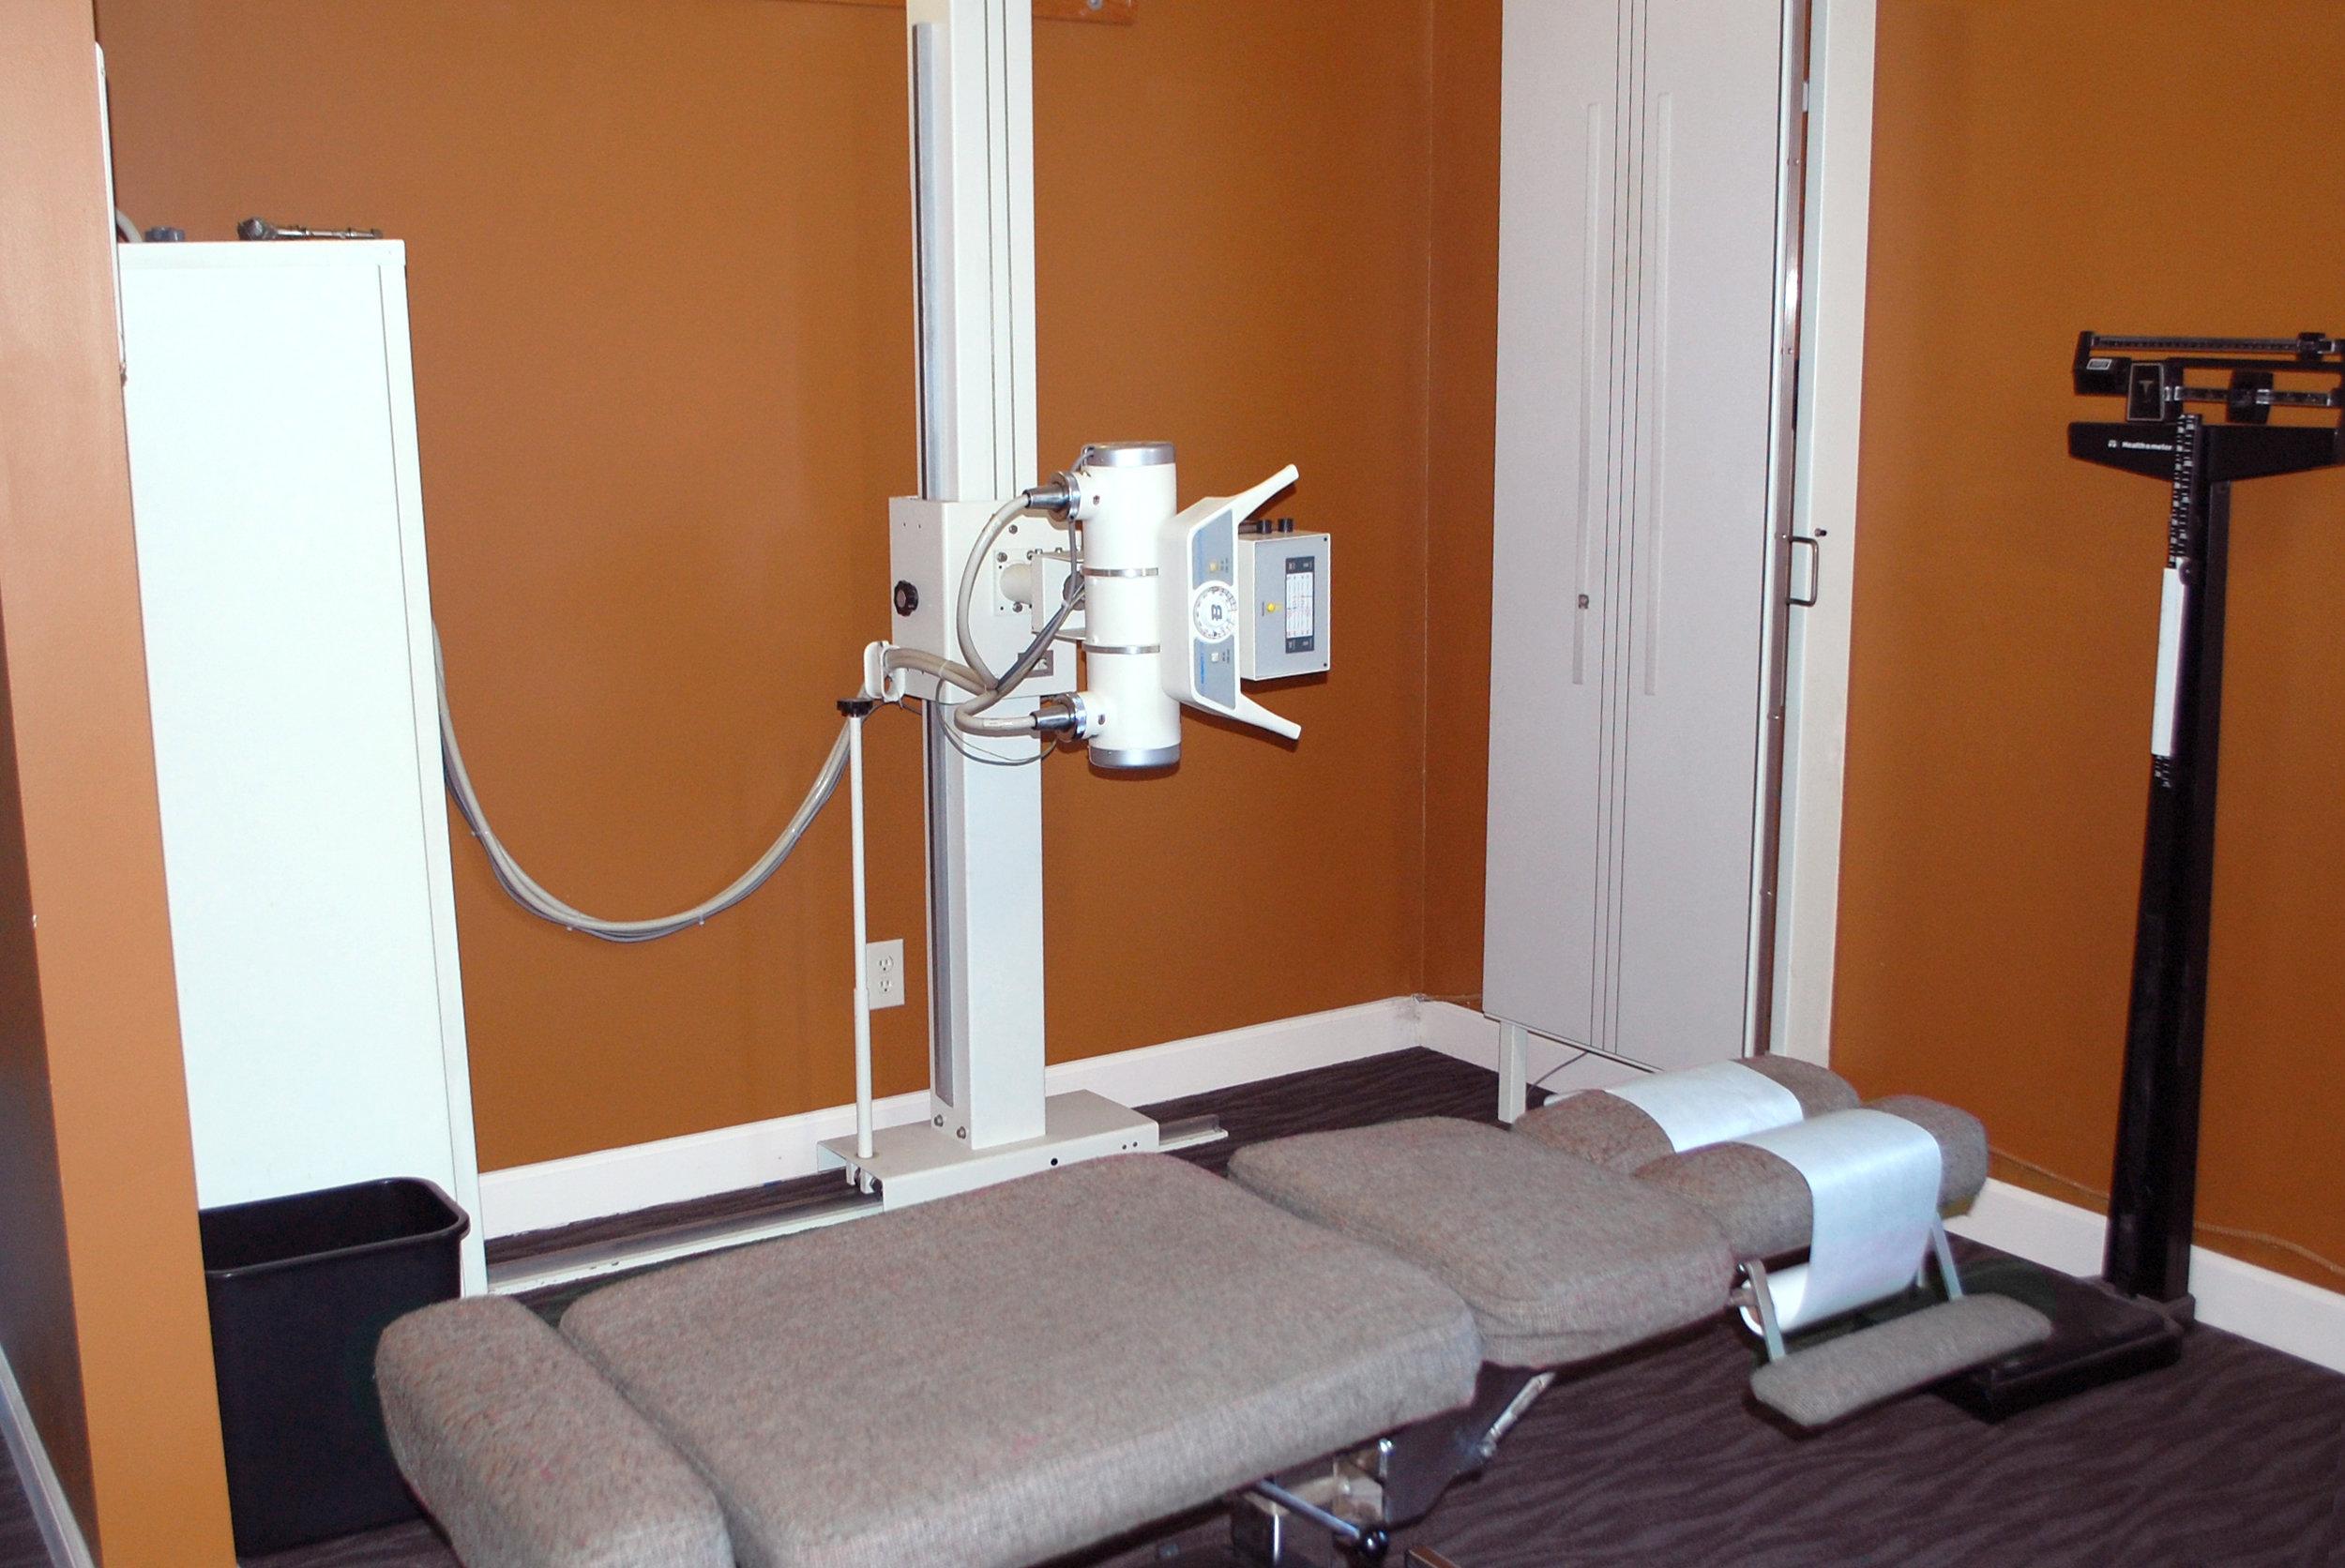 Columbia City Chiropractic Treatment Room 2